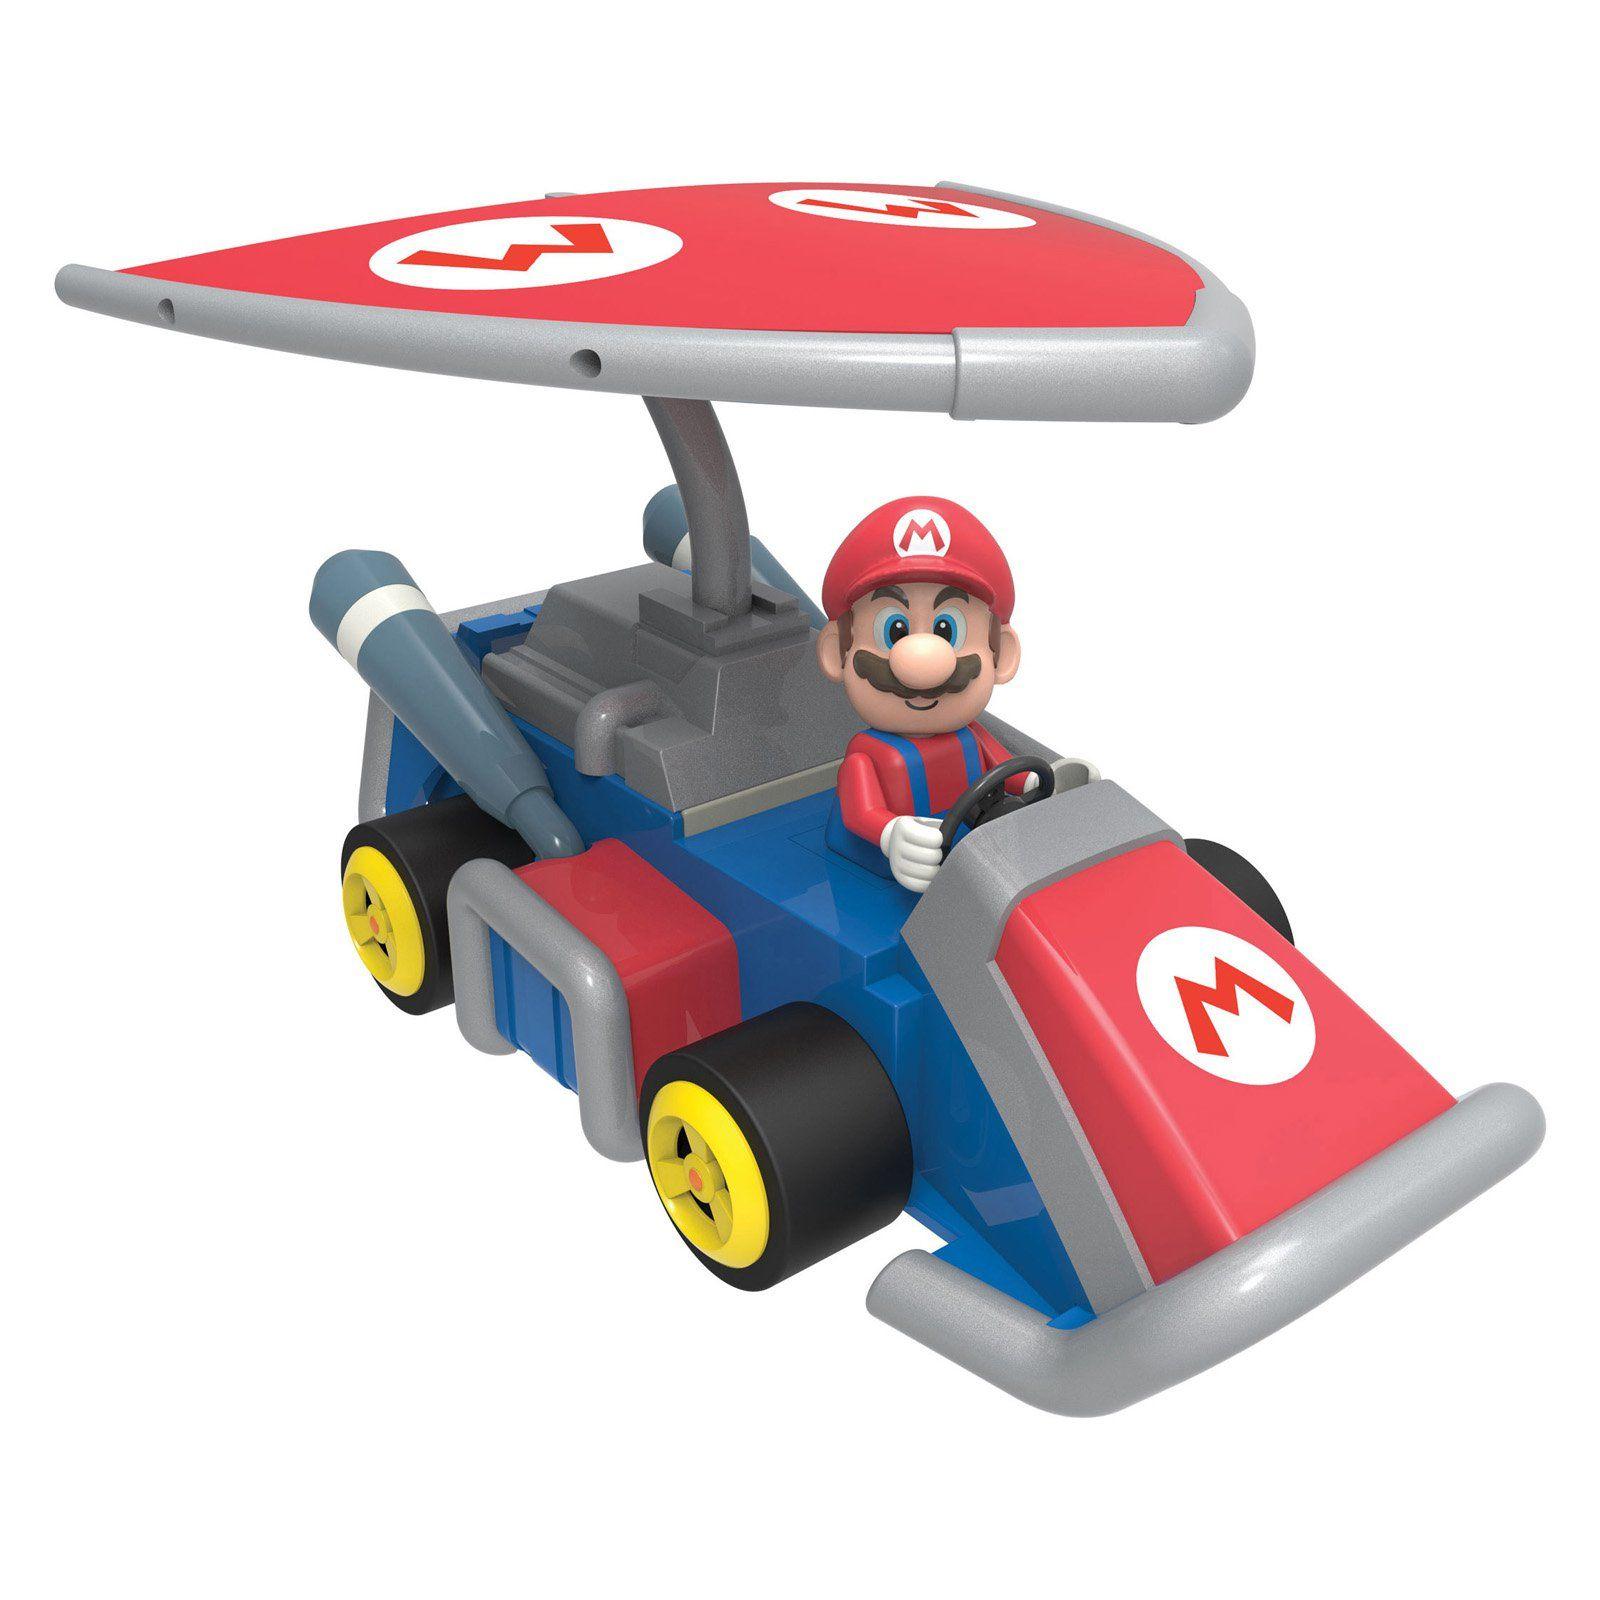 Have To Have It K 39 Nex Mario Kart 7 Mario Glider Kart Building Set 29 99 Hayneedle Mario Kart 7 Super Mario Toys Nintendo Mario Kart